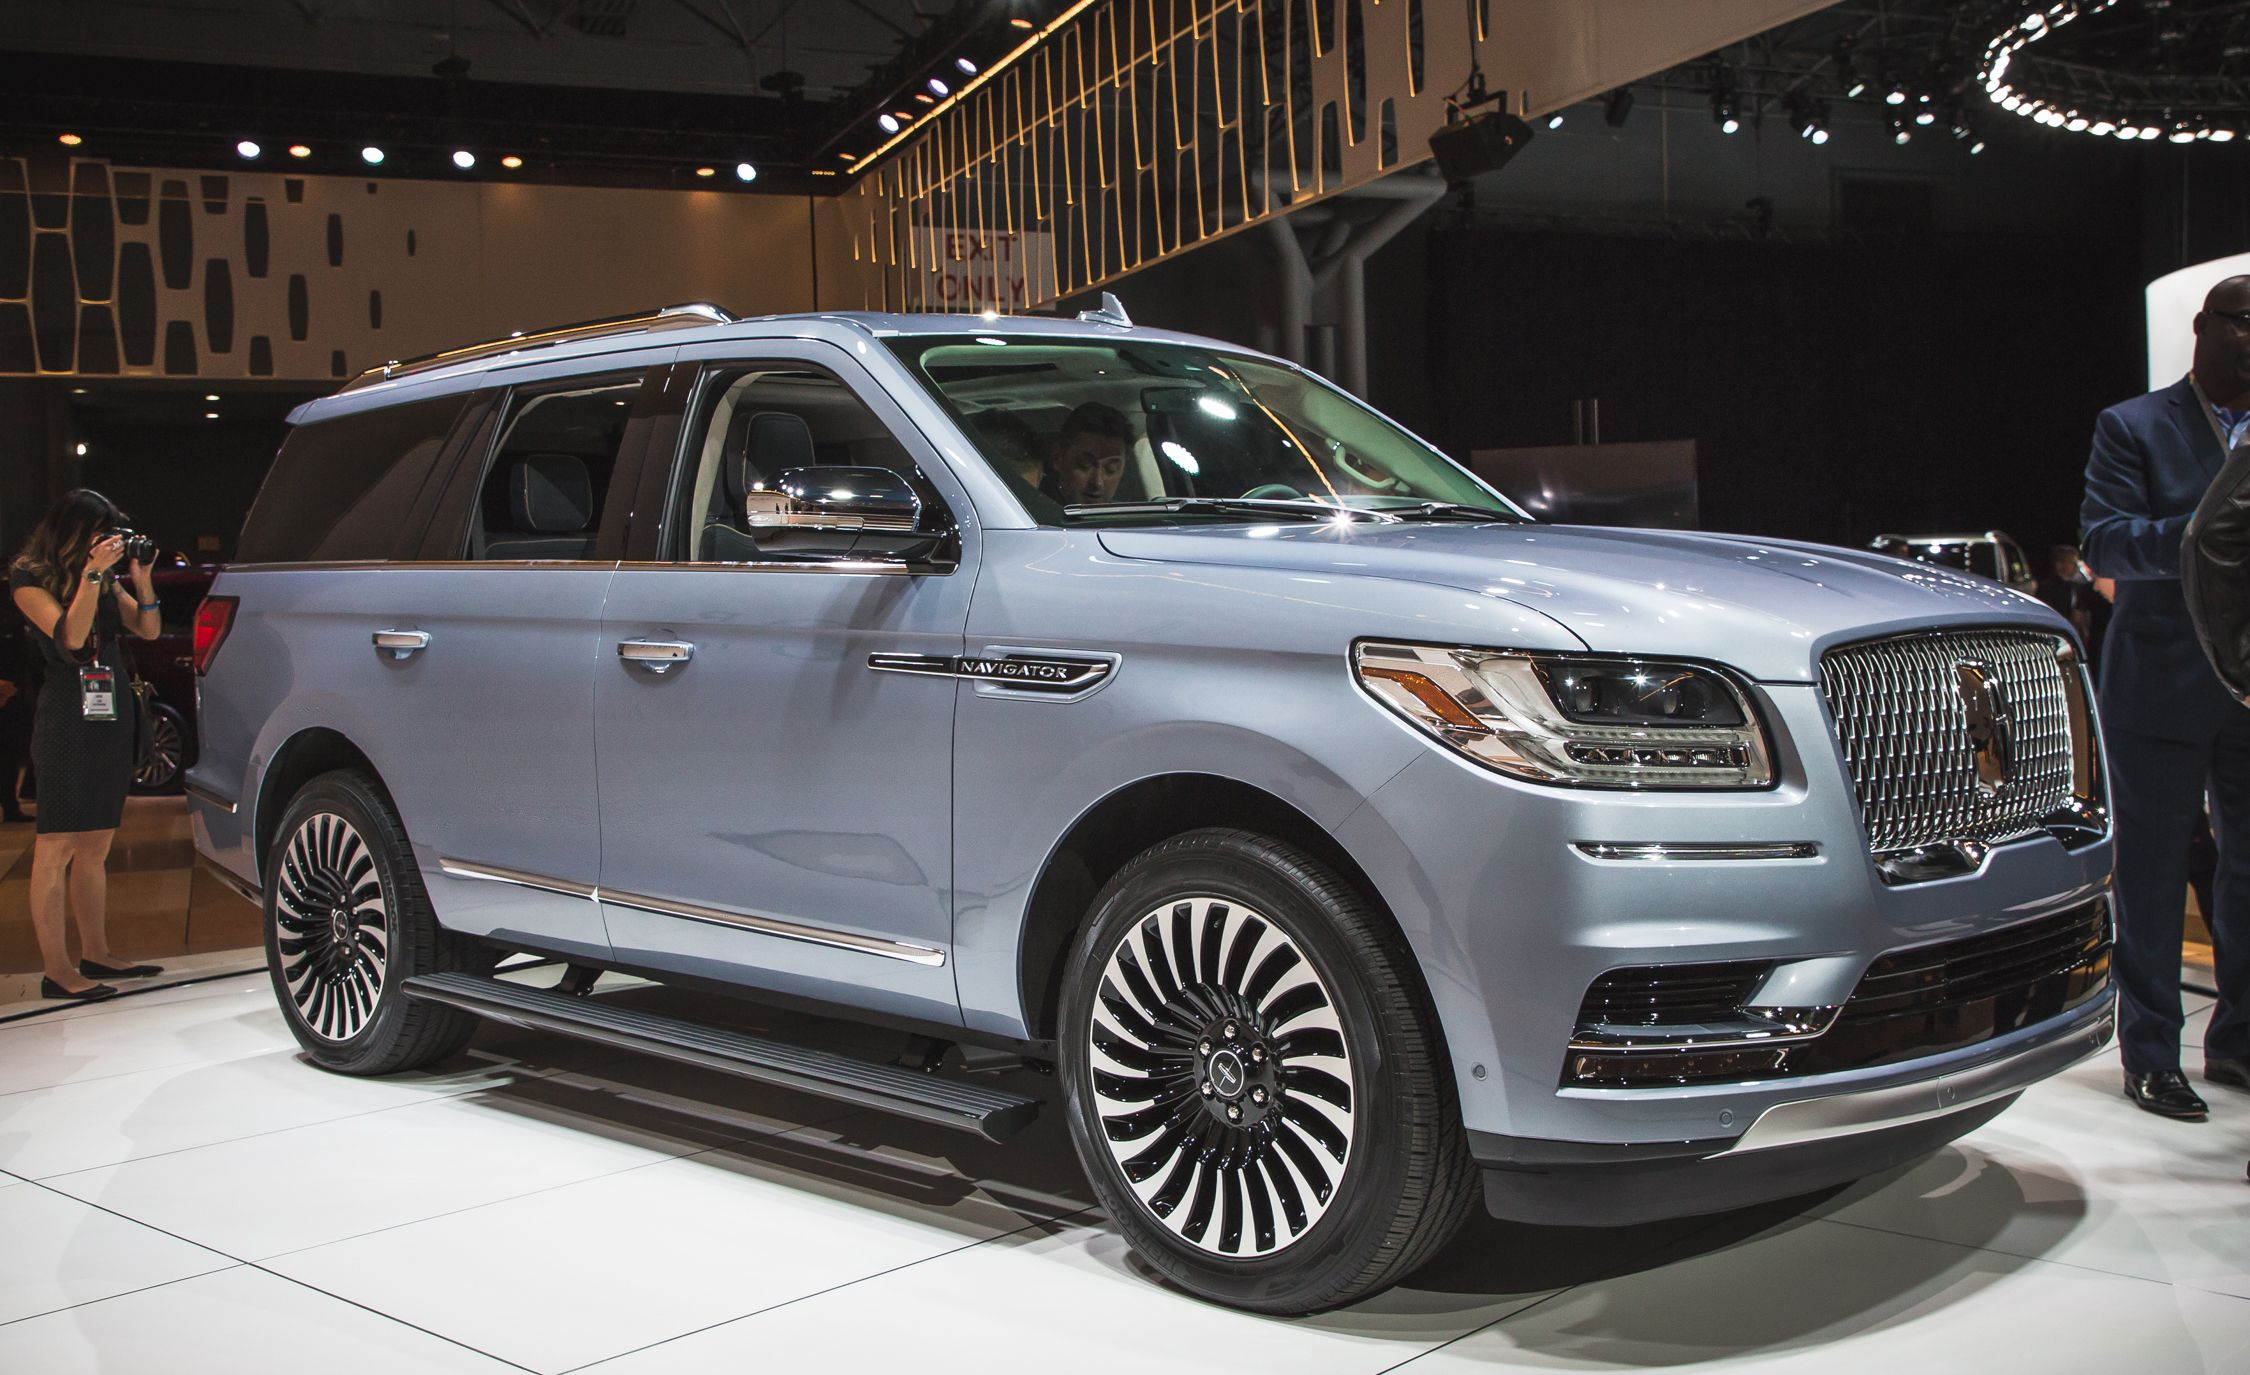 2018 Lincoln Navigator Photos And Info News Car And Driver